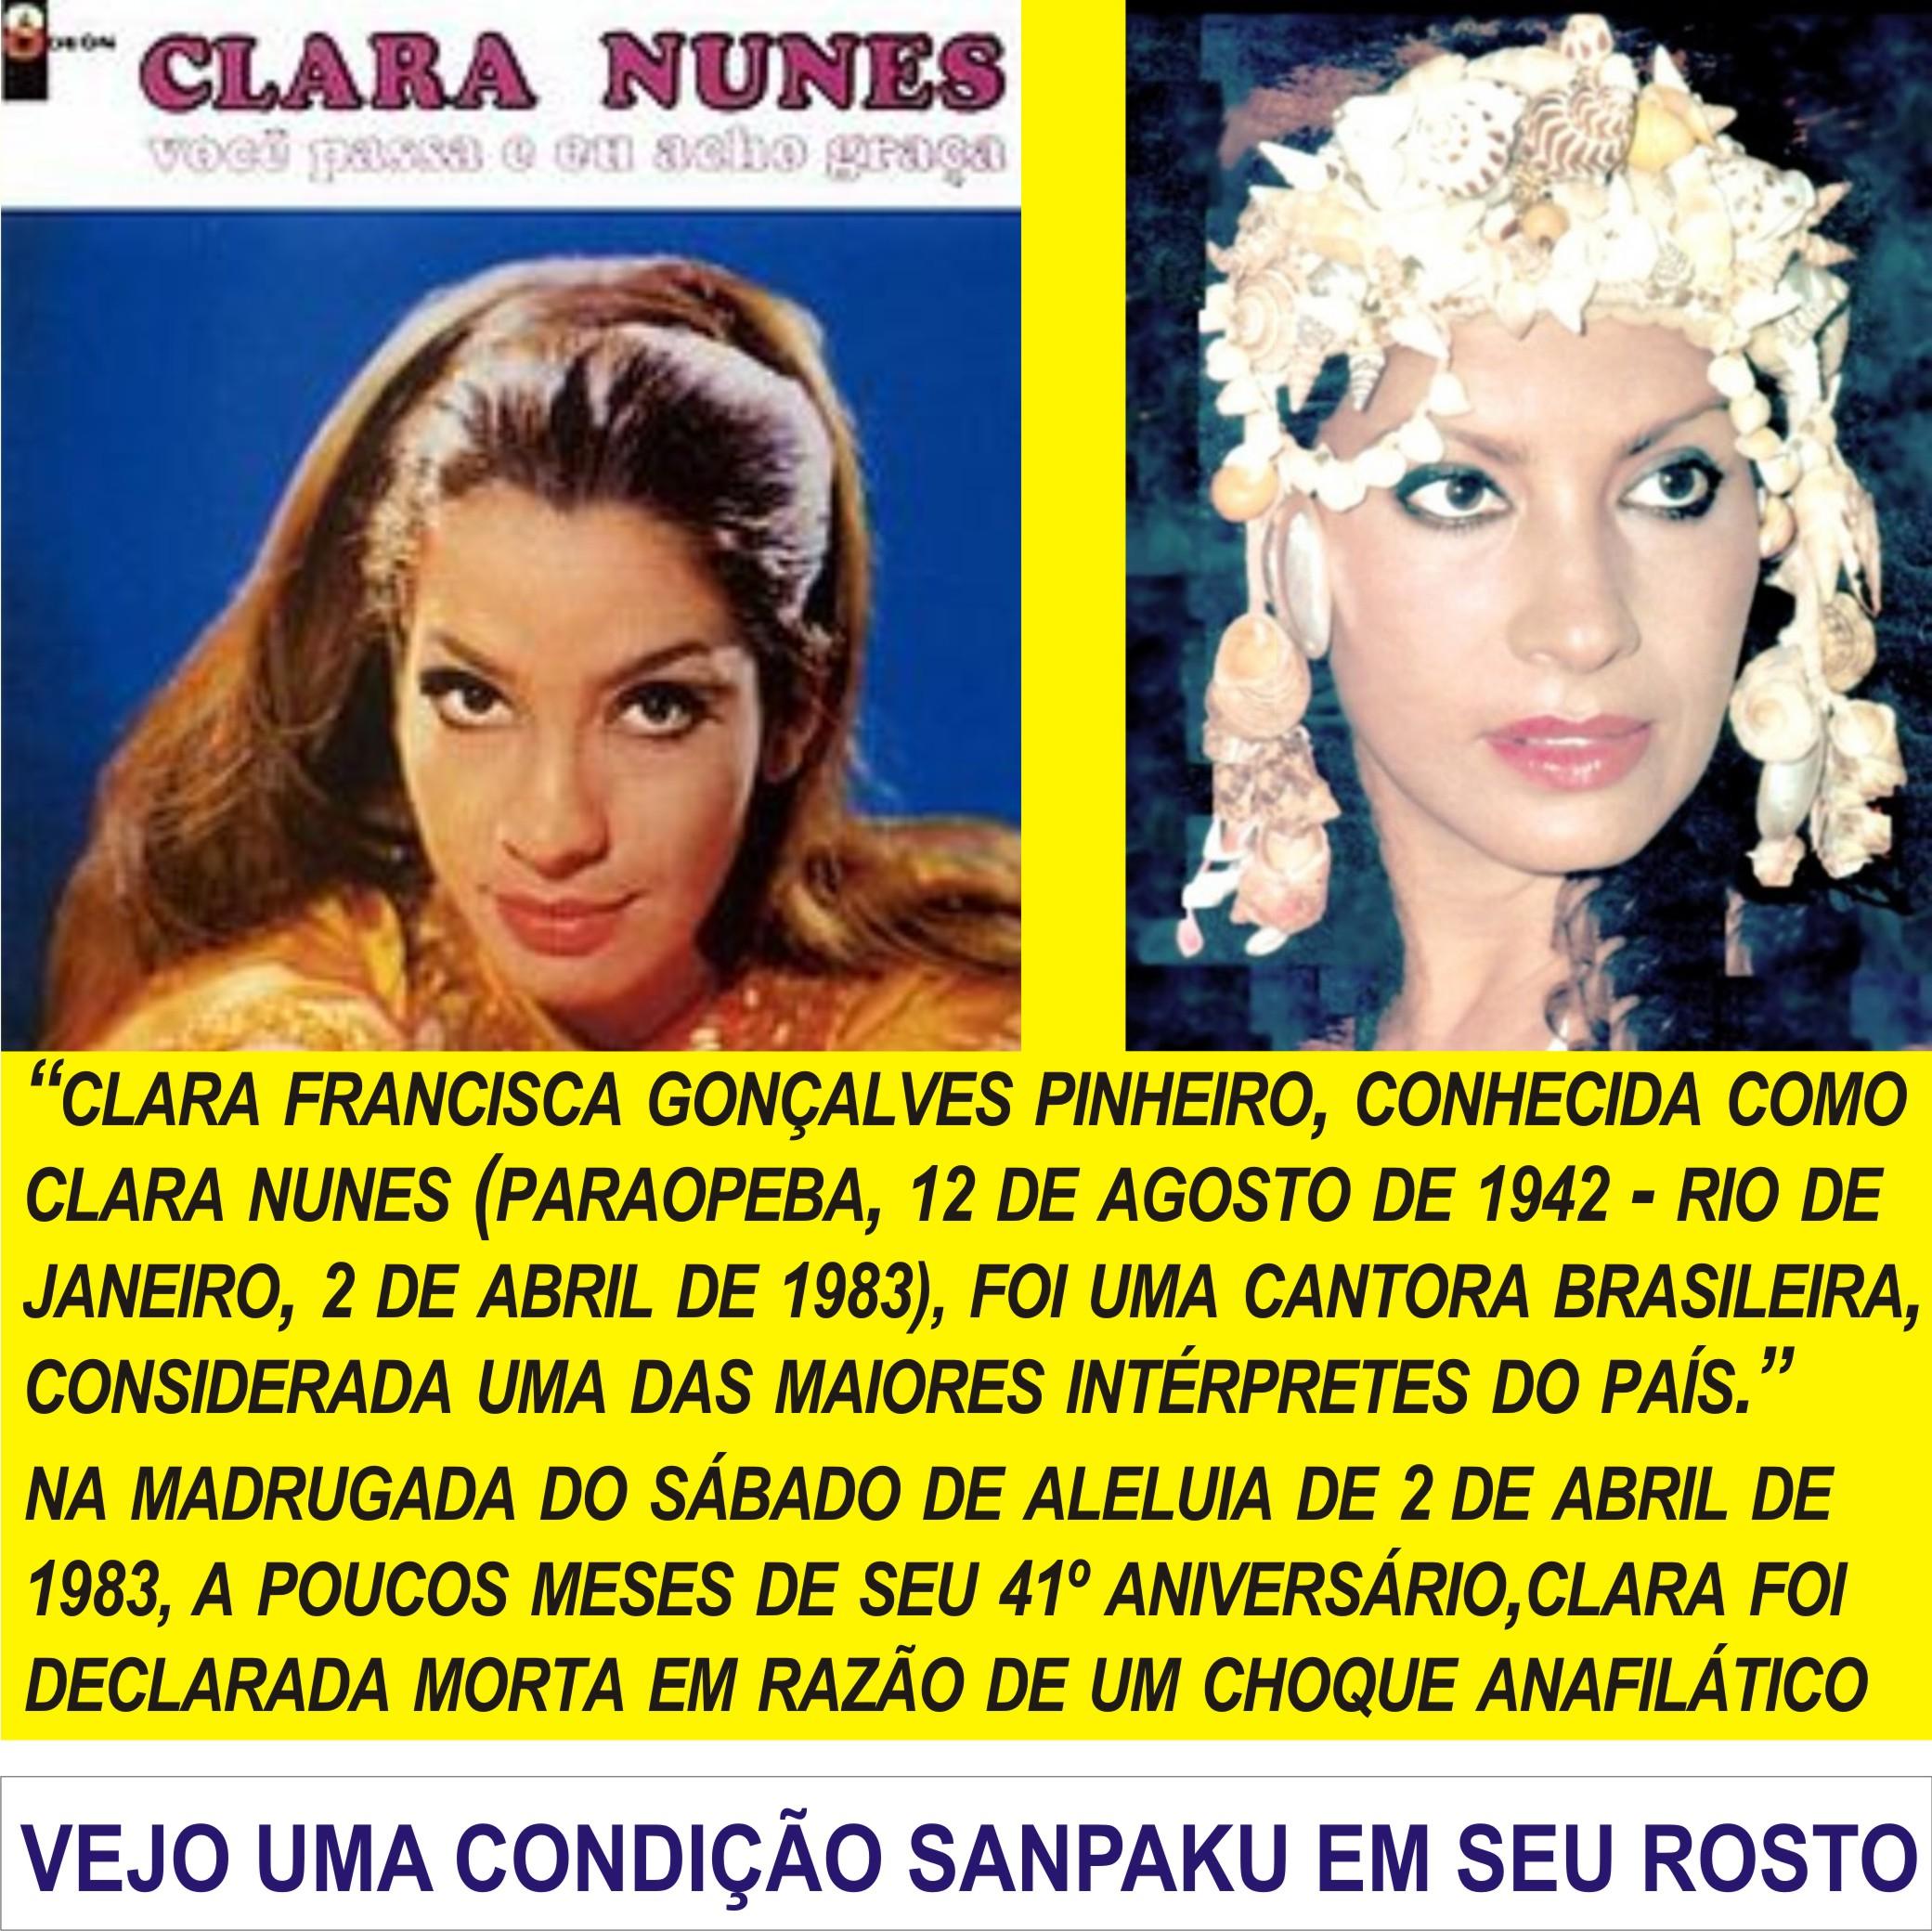 POST 447 CLARA NUNES